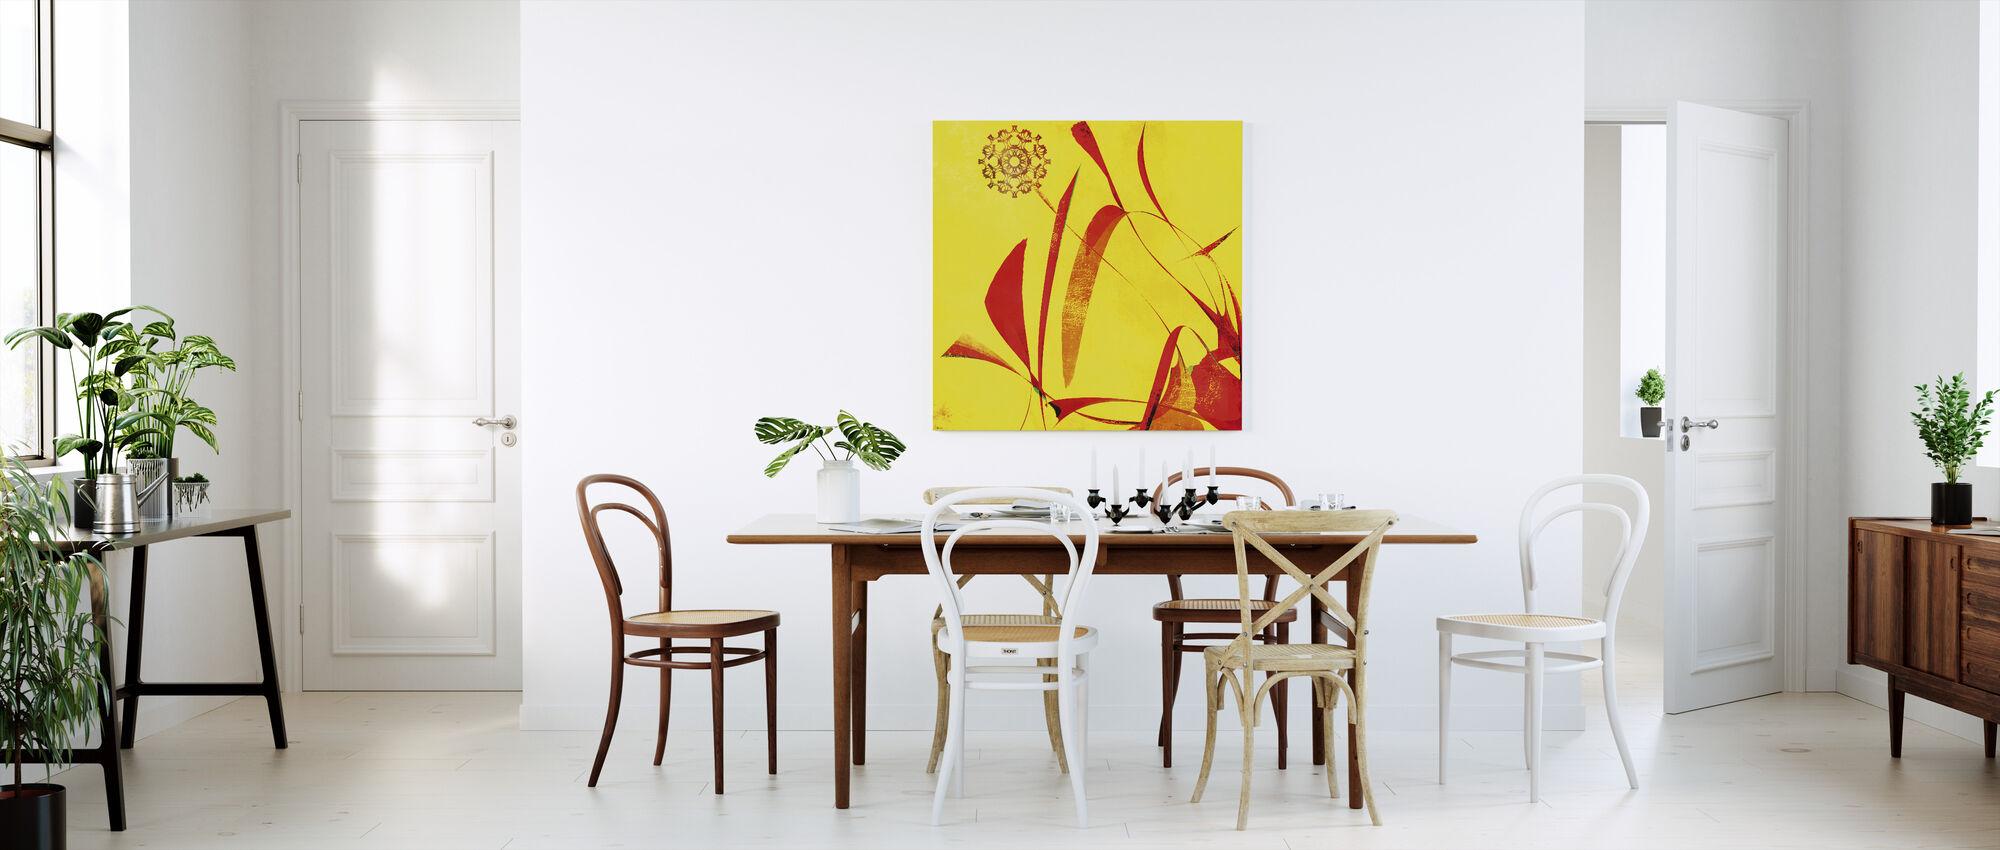 Abstract Dandelion - Canvas print - Kitchen